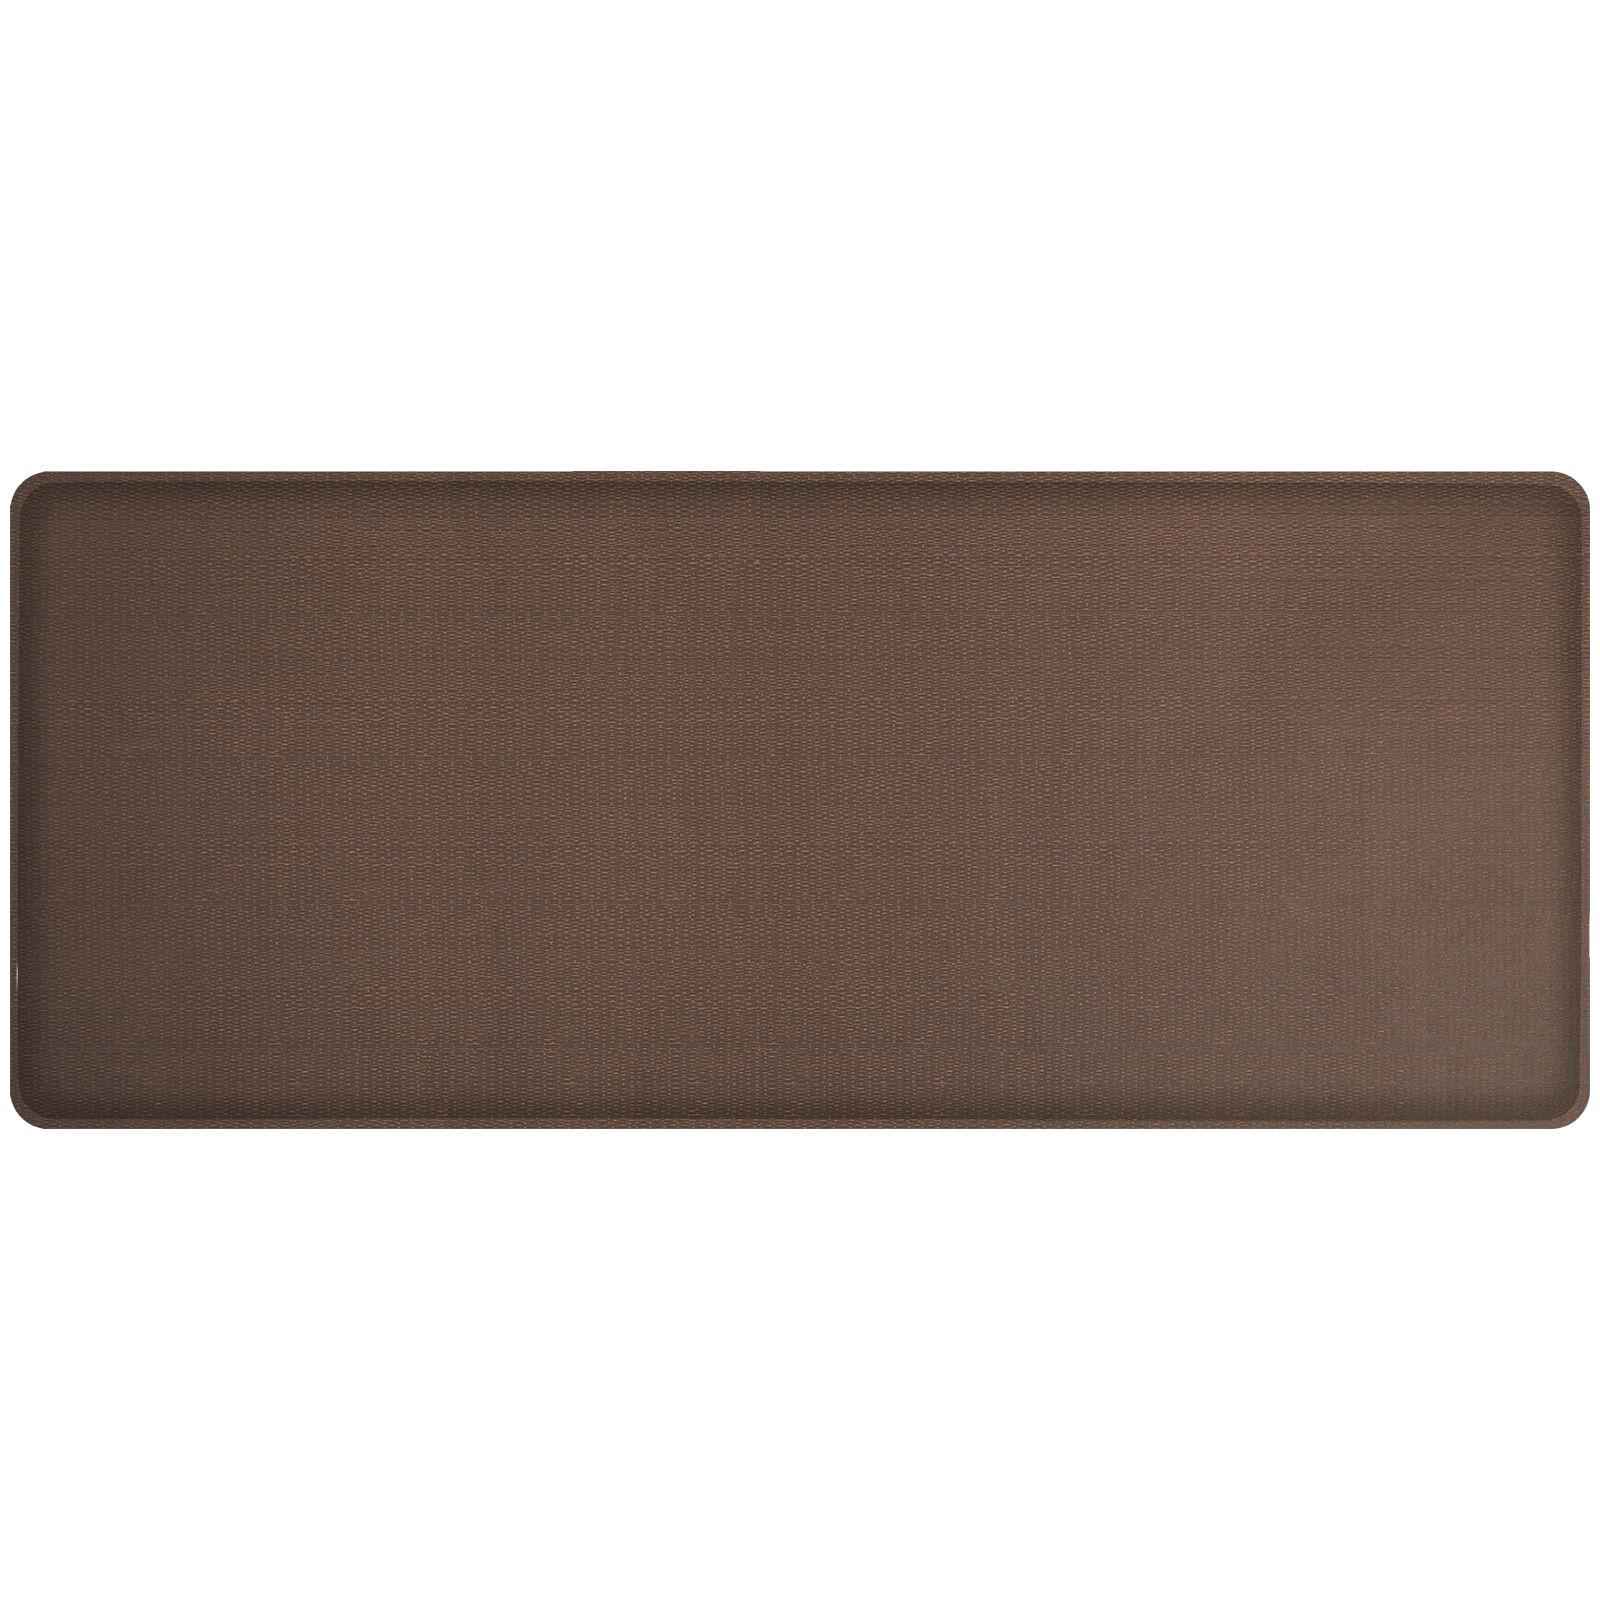 Rattan Classic Anti-Fatigue Comfort Kitchen Mat Mat Size: 1'8